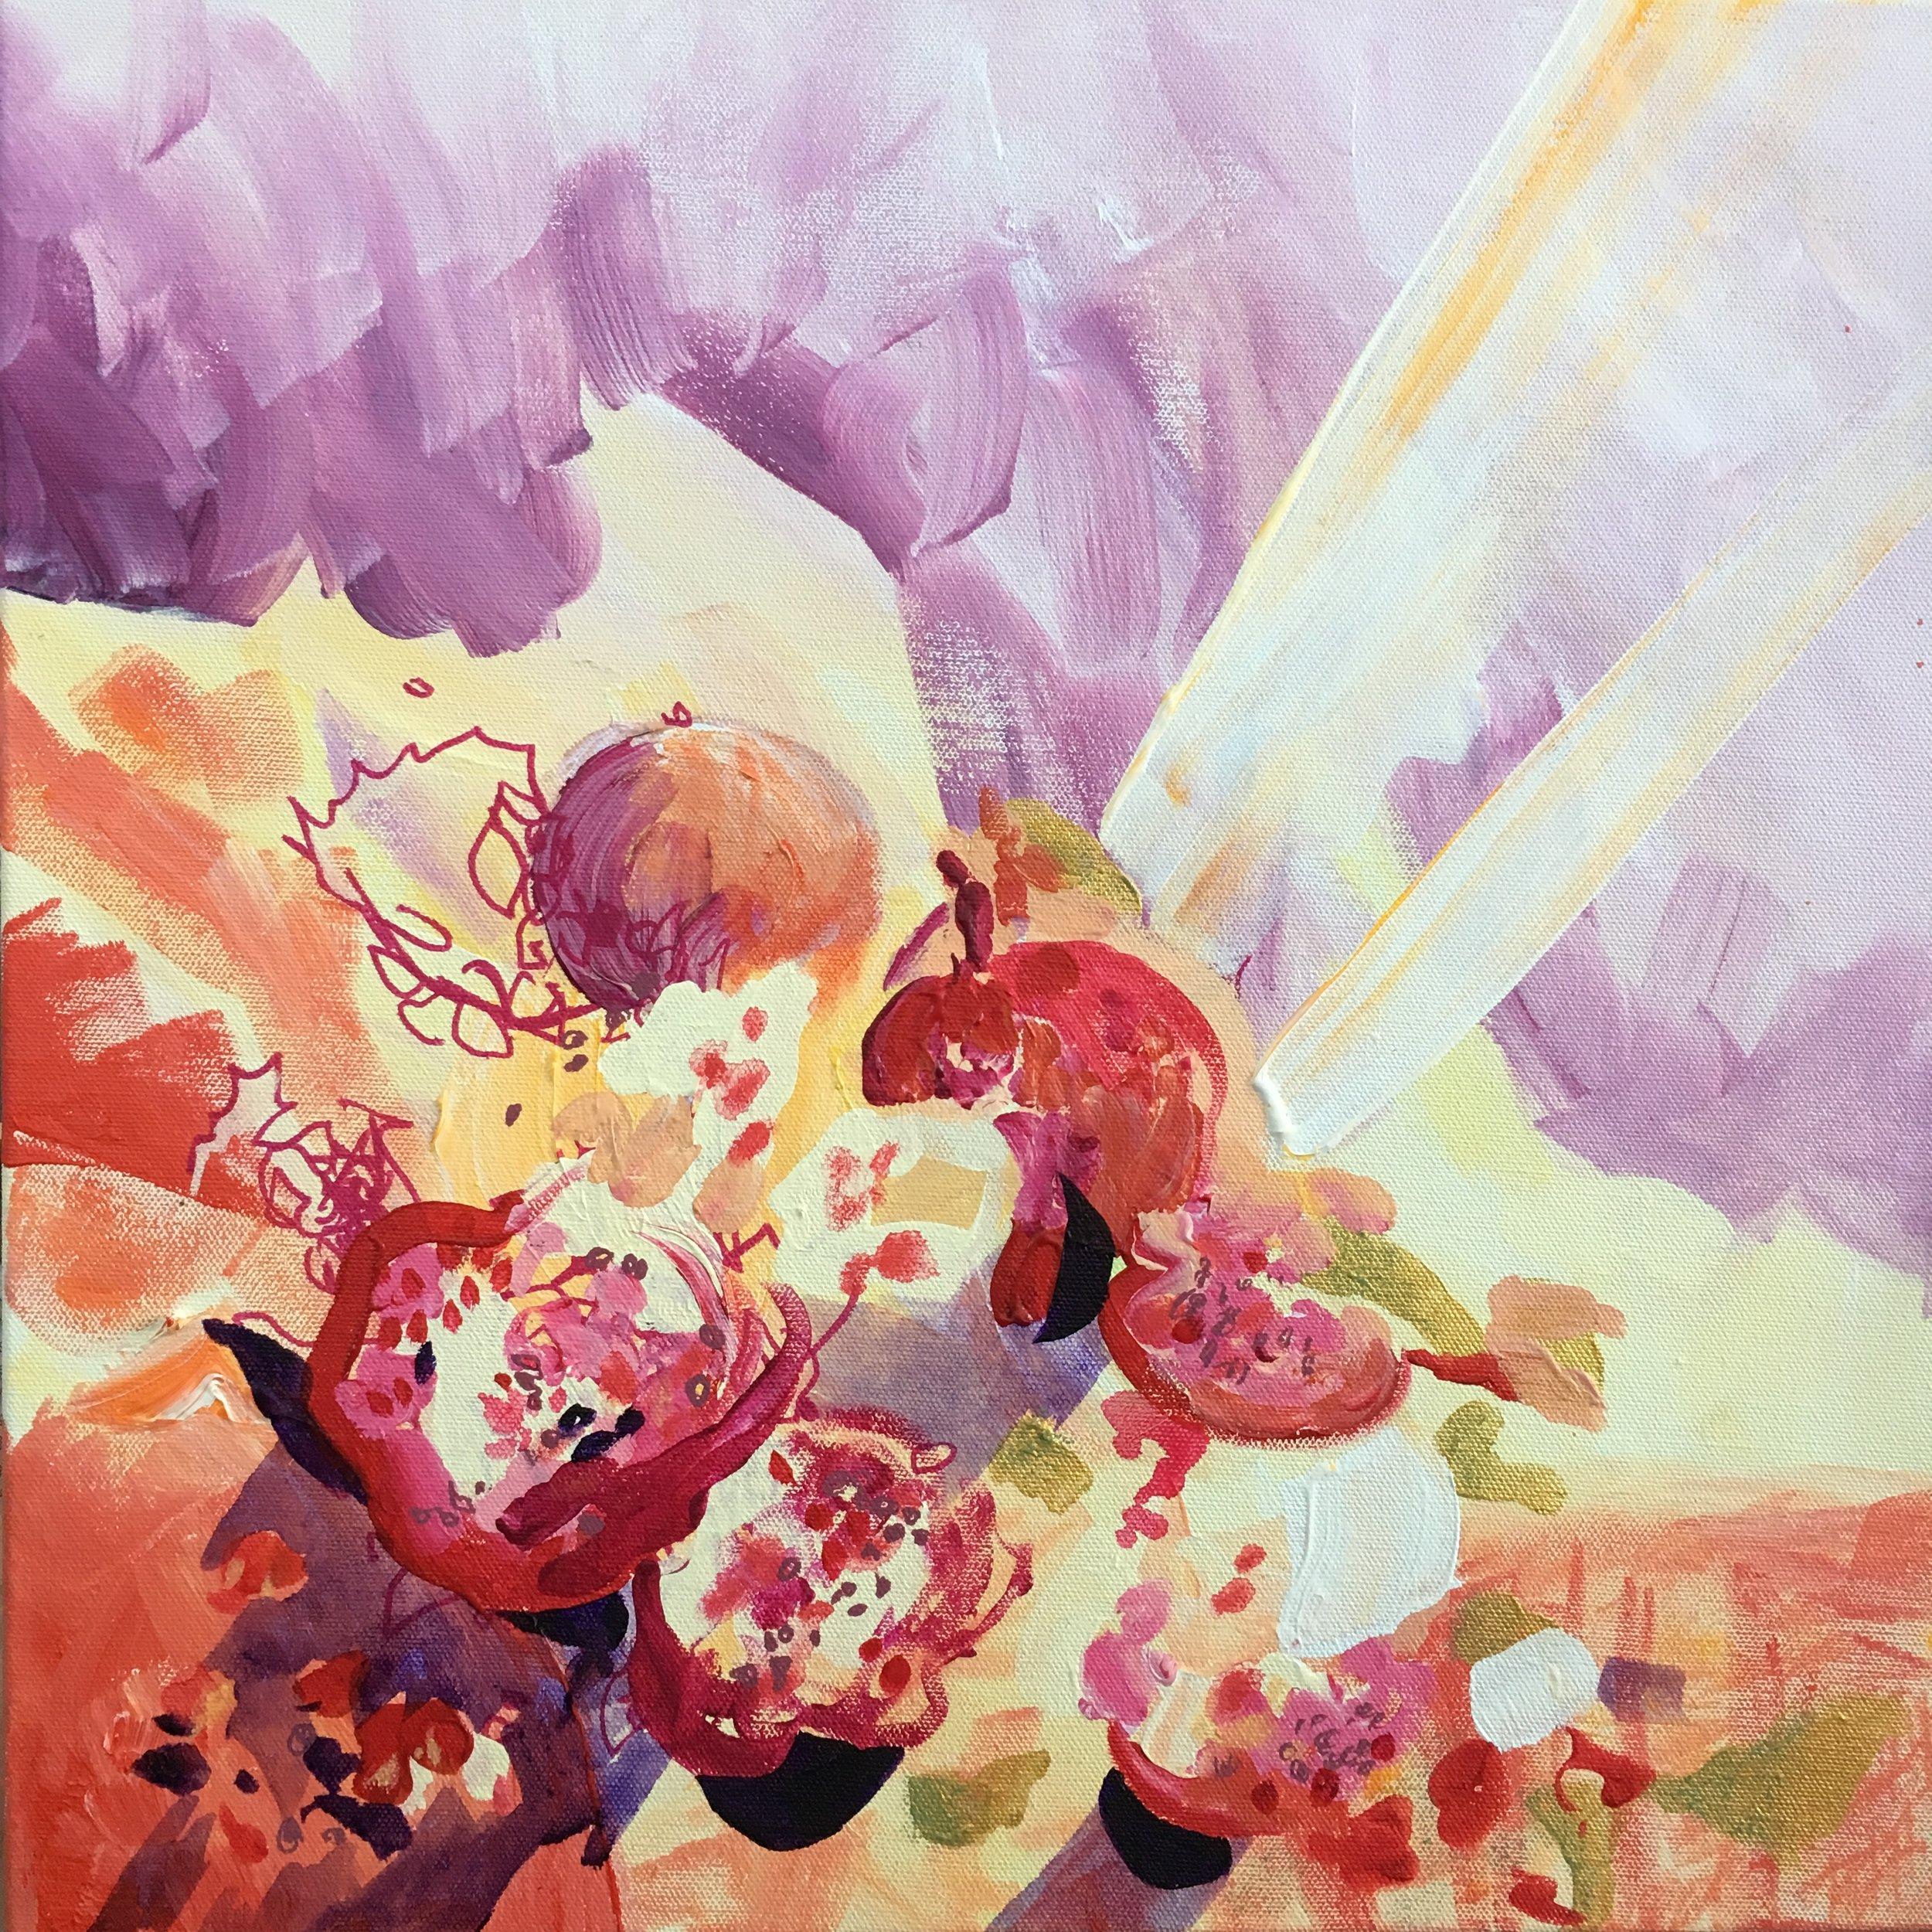 Rose Wintergreen Heart Bursts Like Pomegranate_acrylic on 18 x18%22 canvas, Rose Wintergreen 2019.jpg